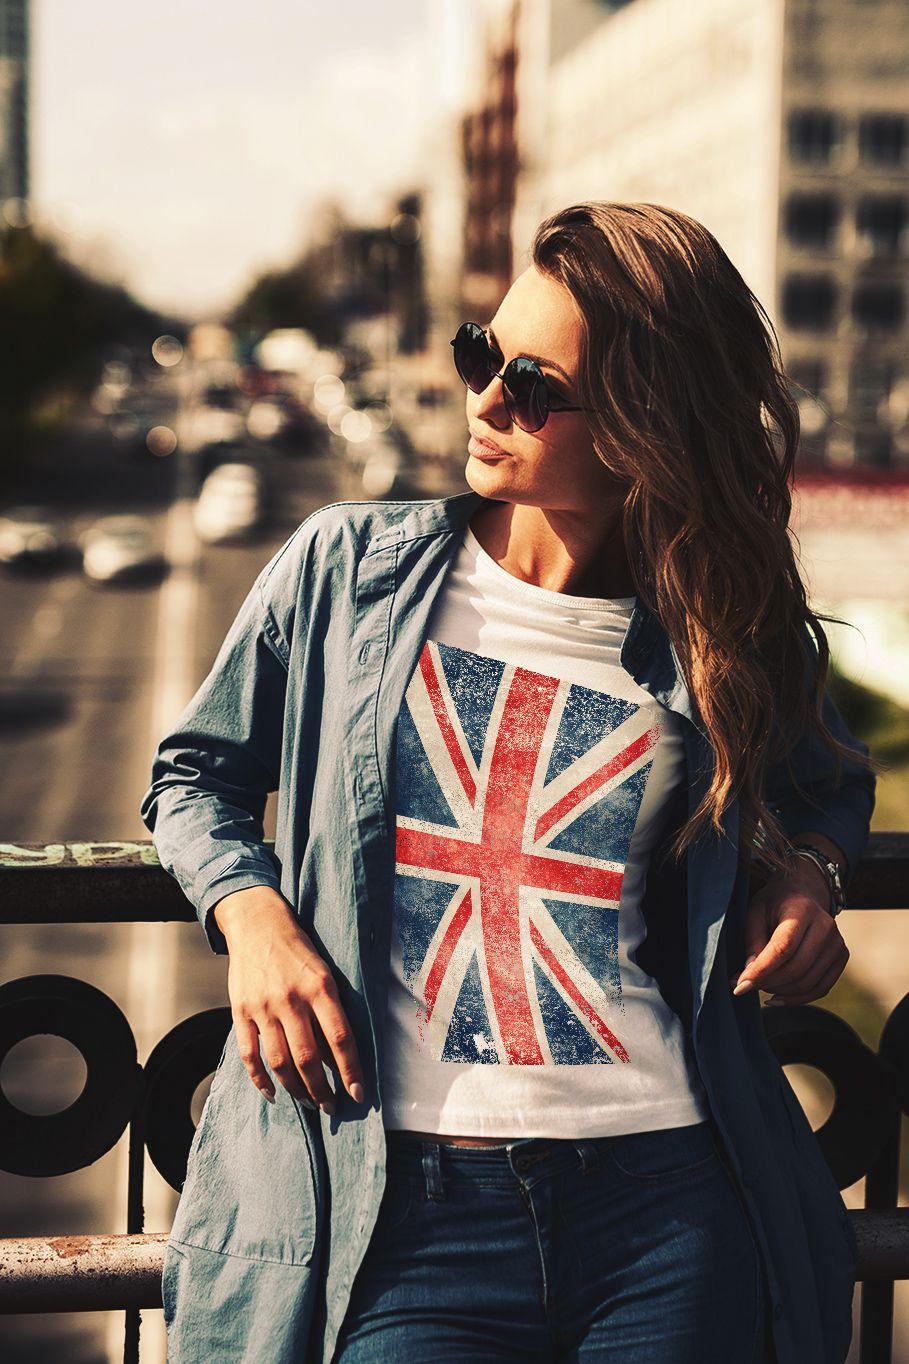 United Kingdom British Flag Sweatshirt  UK  England  Hoodie SIZES S-3XL